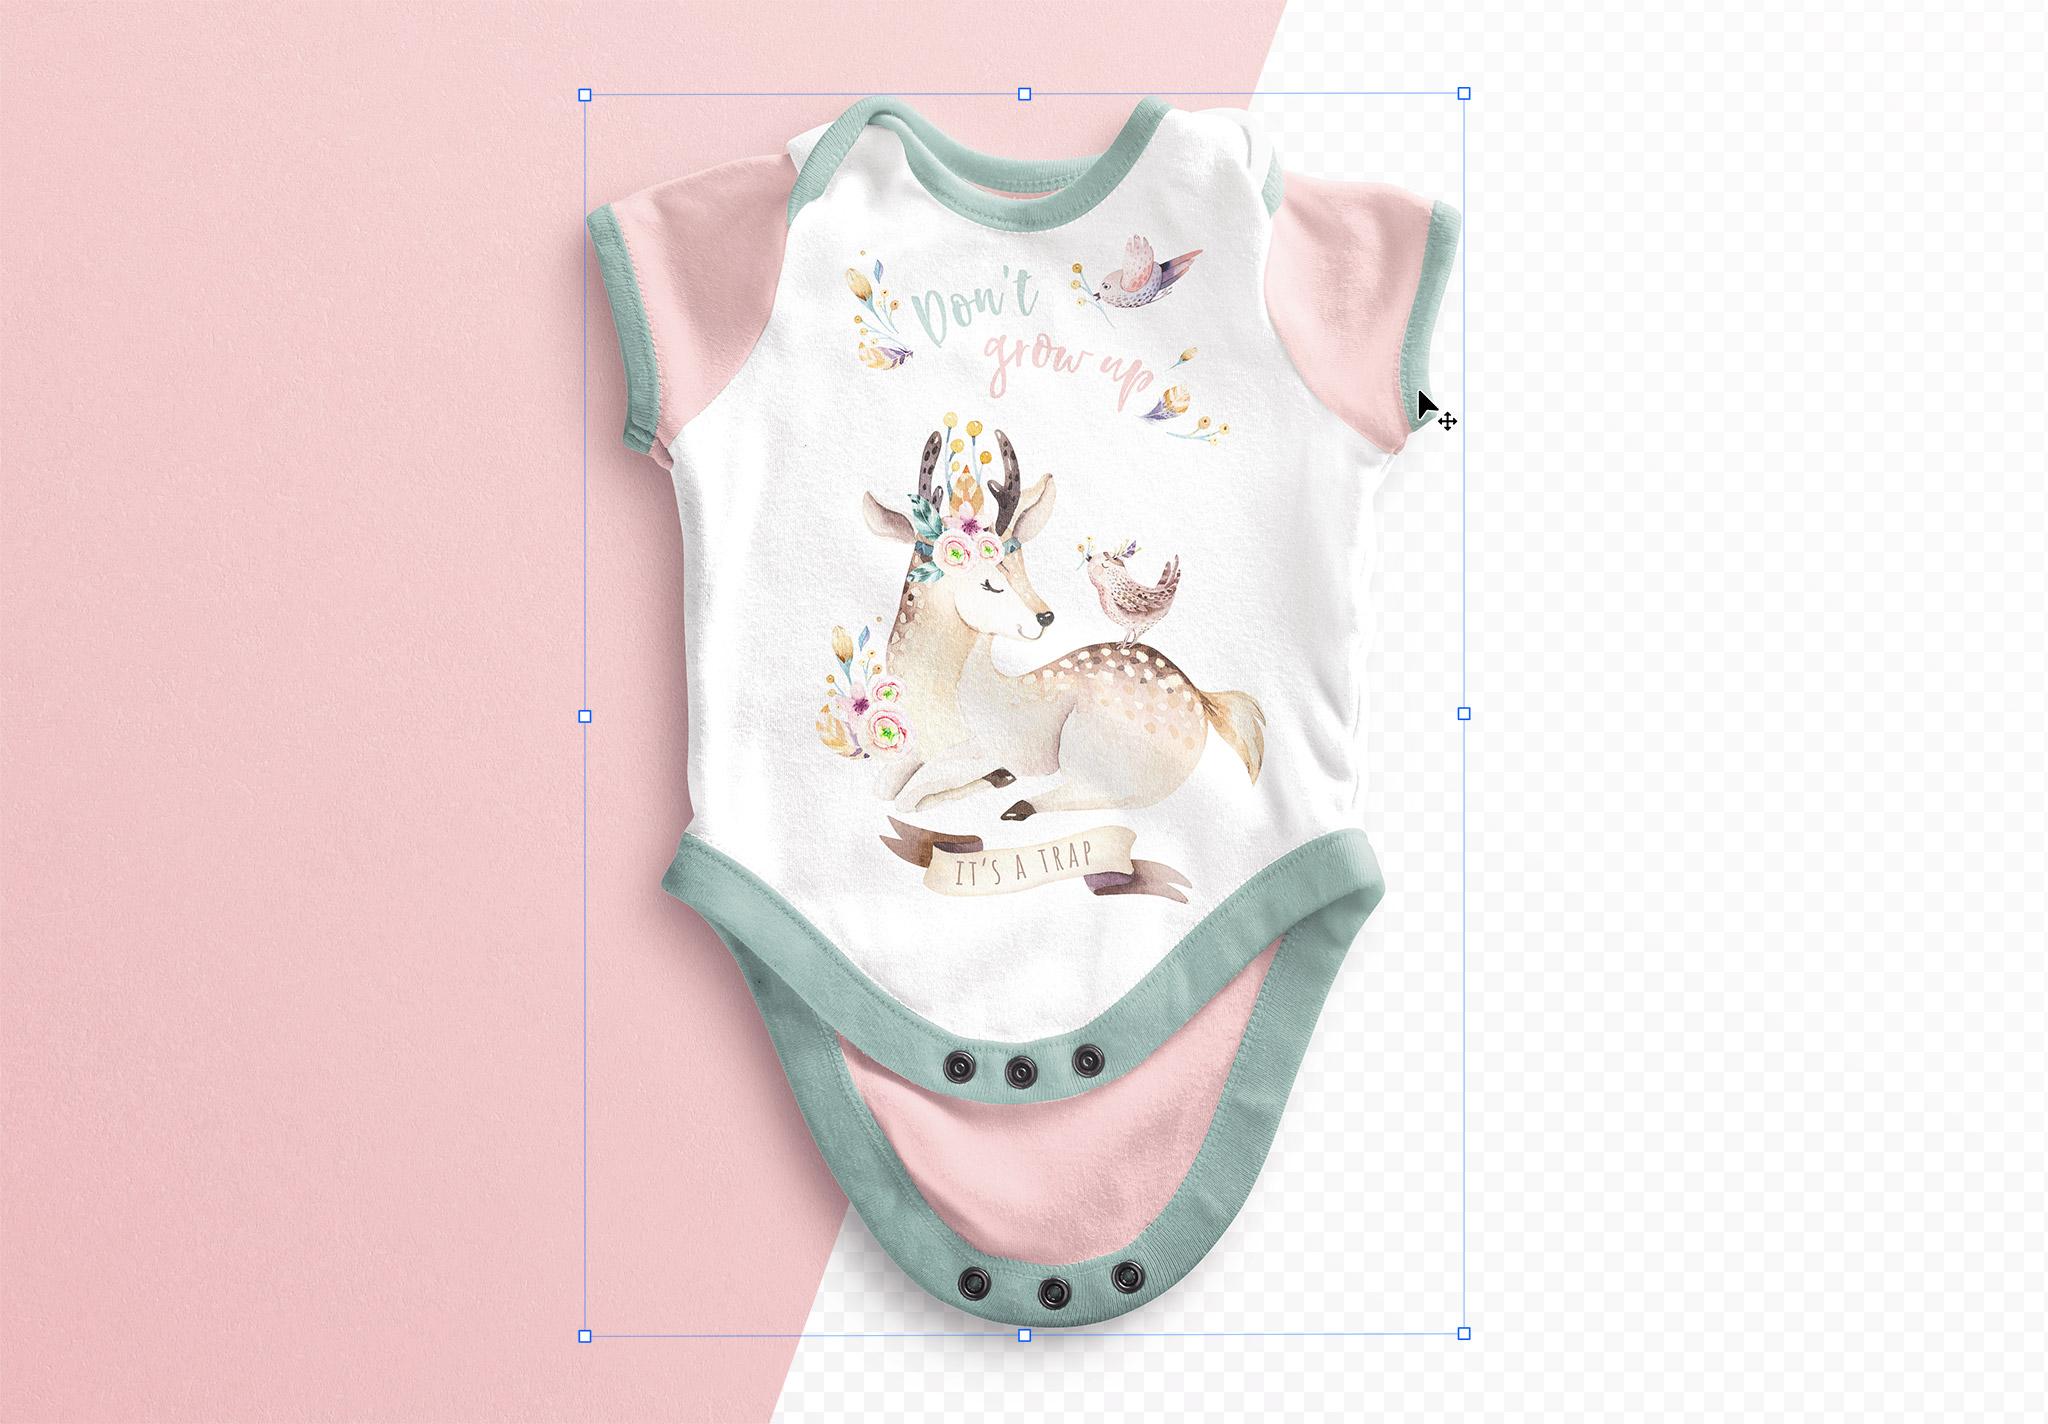 Baby Vest Open Mockup thumbnail 1